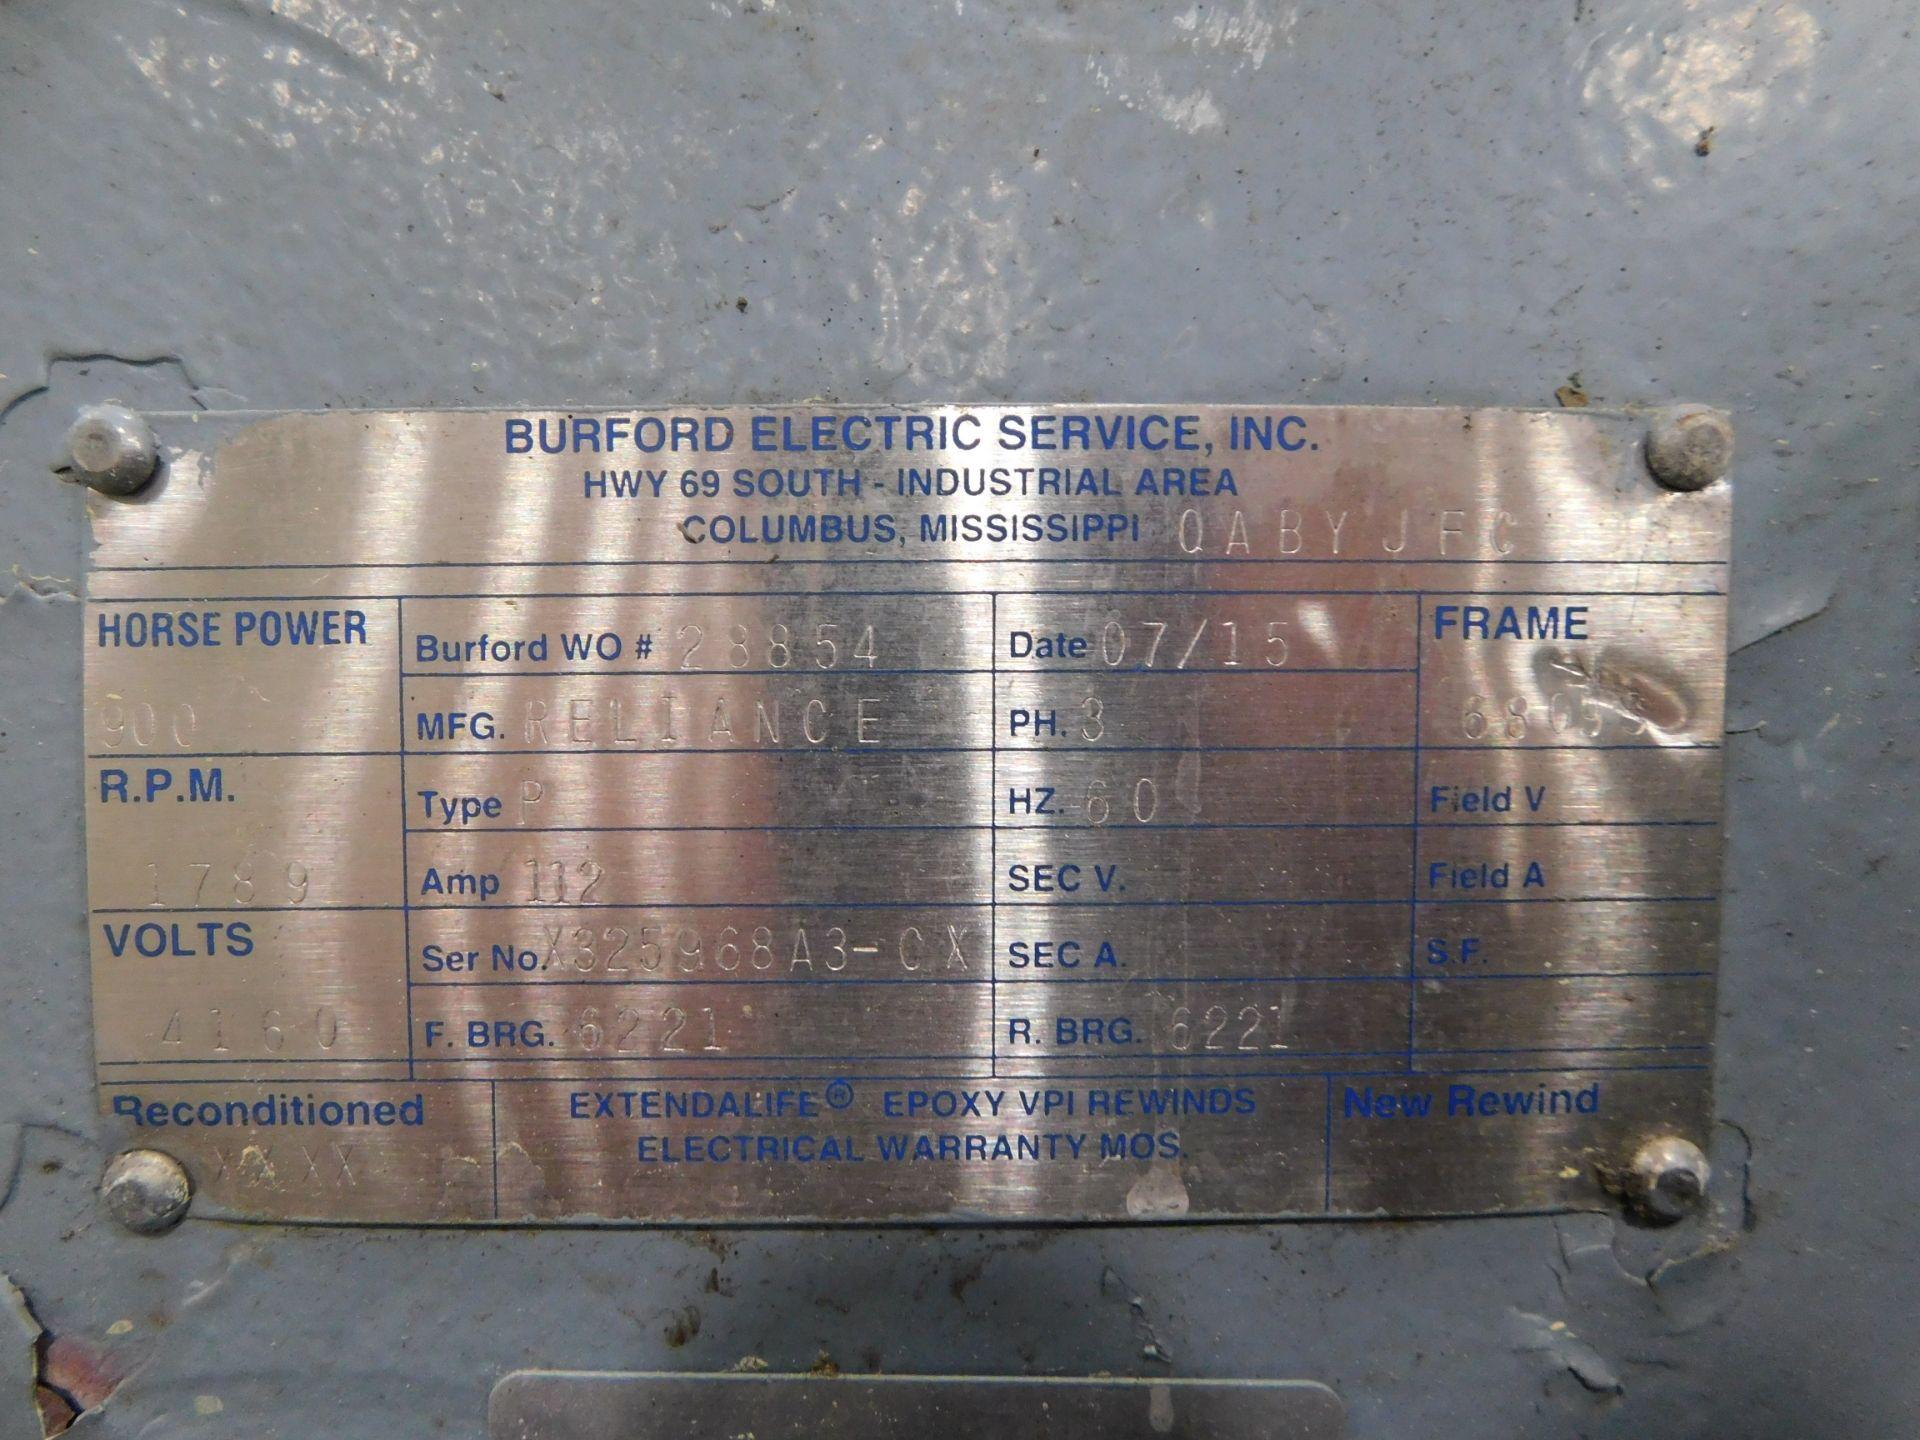 Reliance AC Duty Master Motor. 900 HP. 3 Ph. 60 Hz. 4160 V. 1789 RPM. 6809S. Type P. - Image 7 of 10